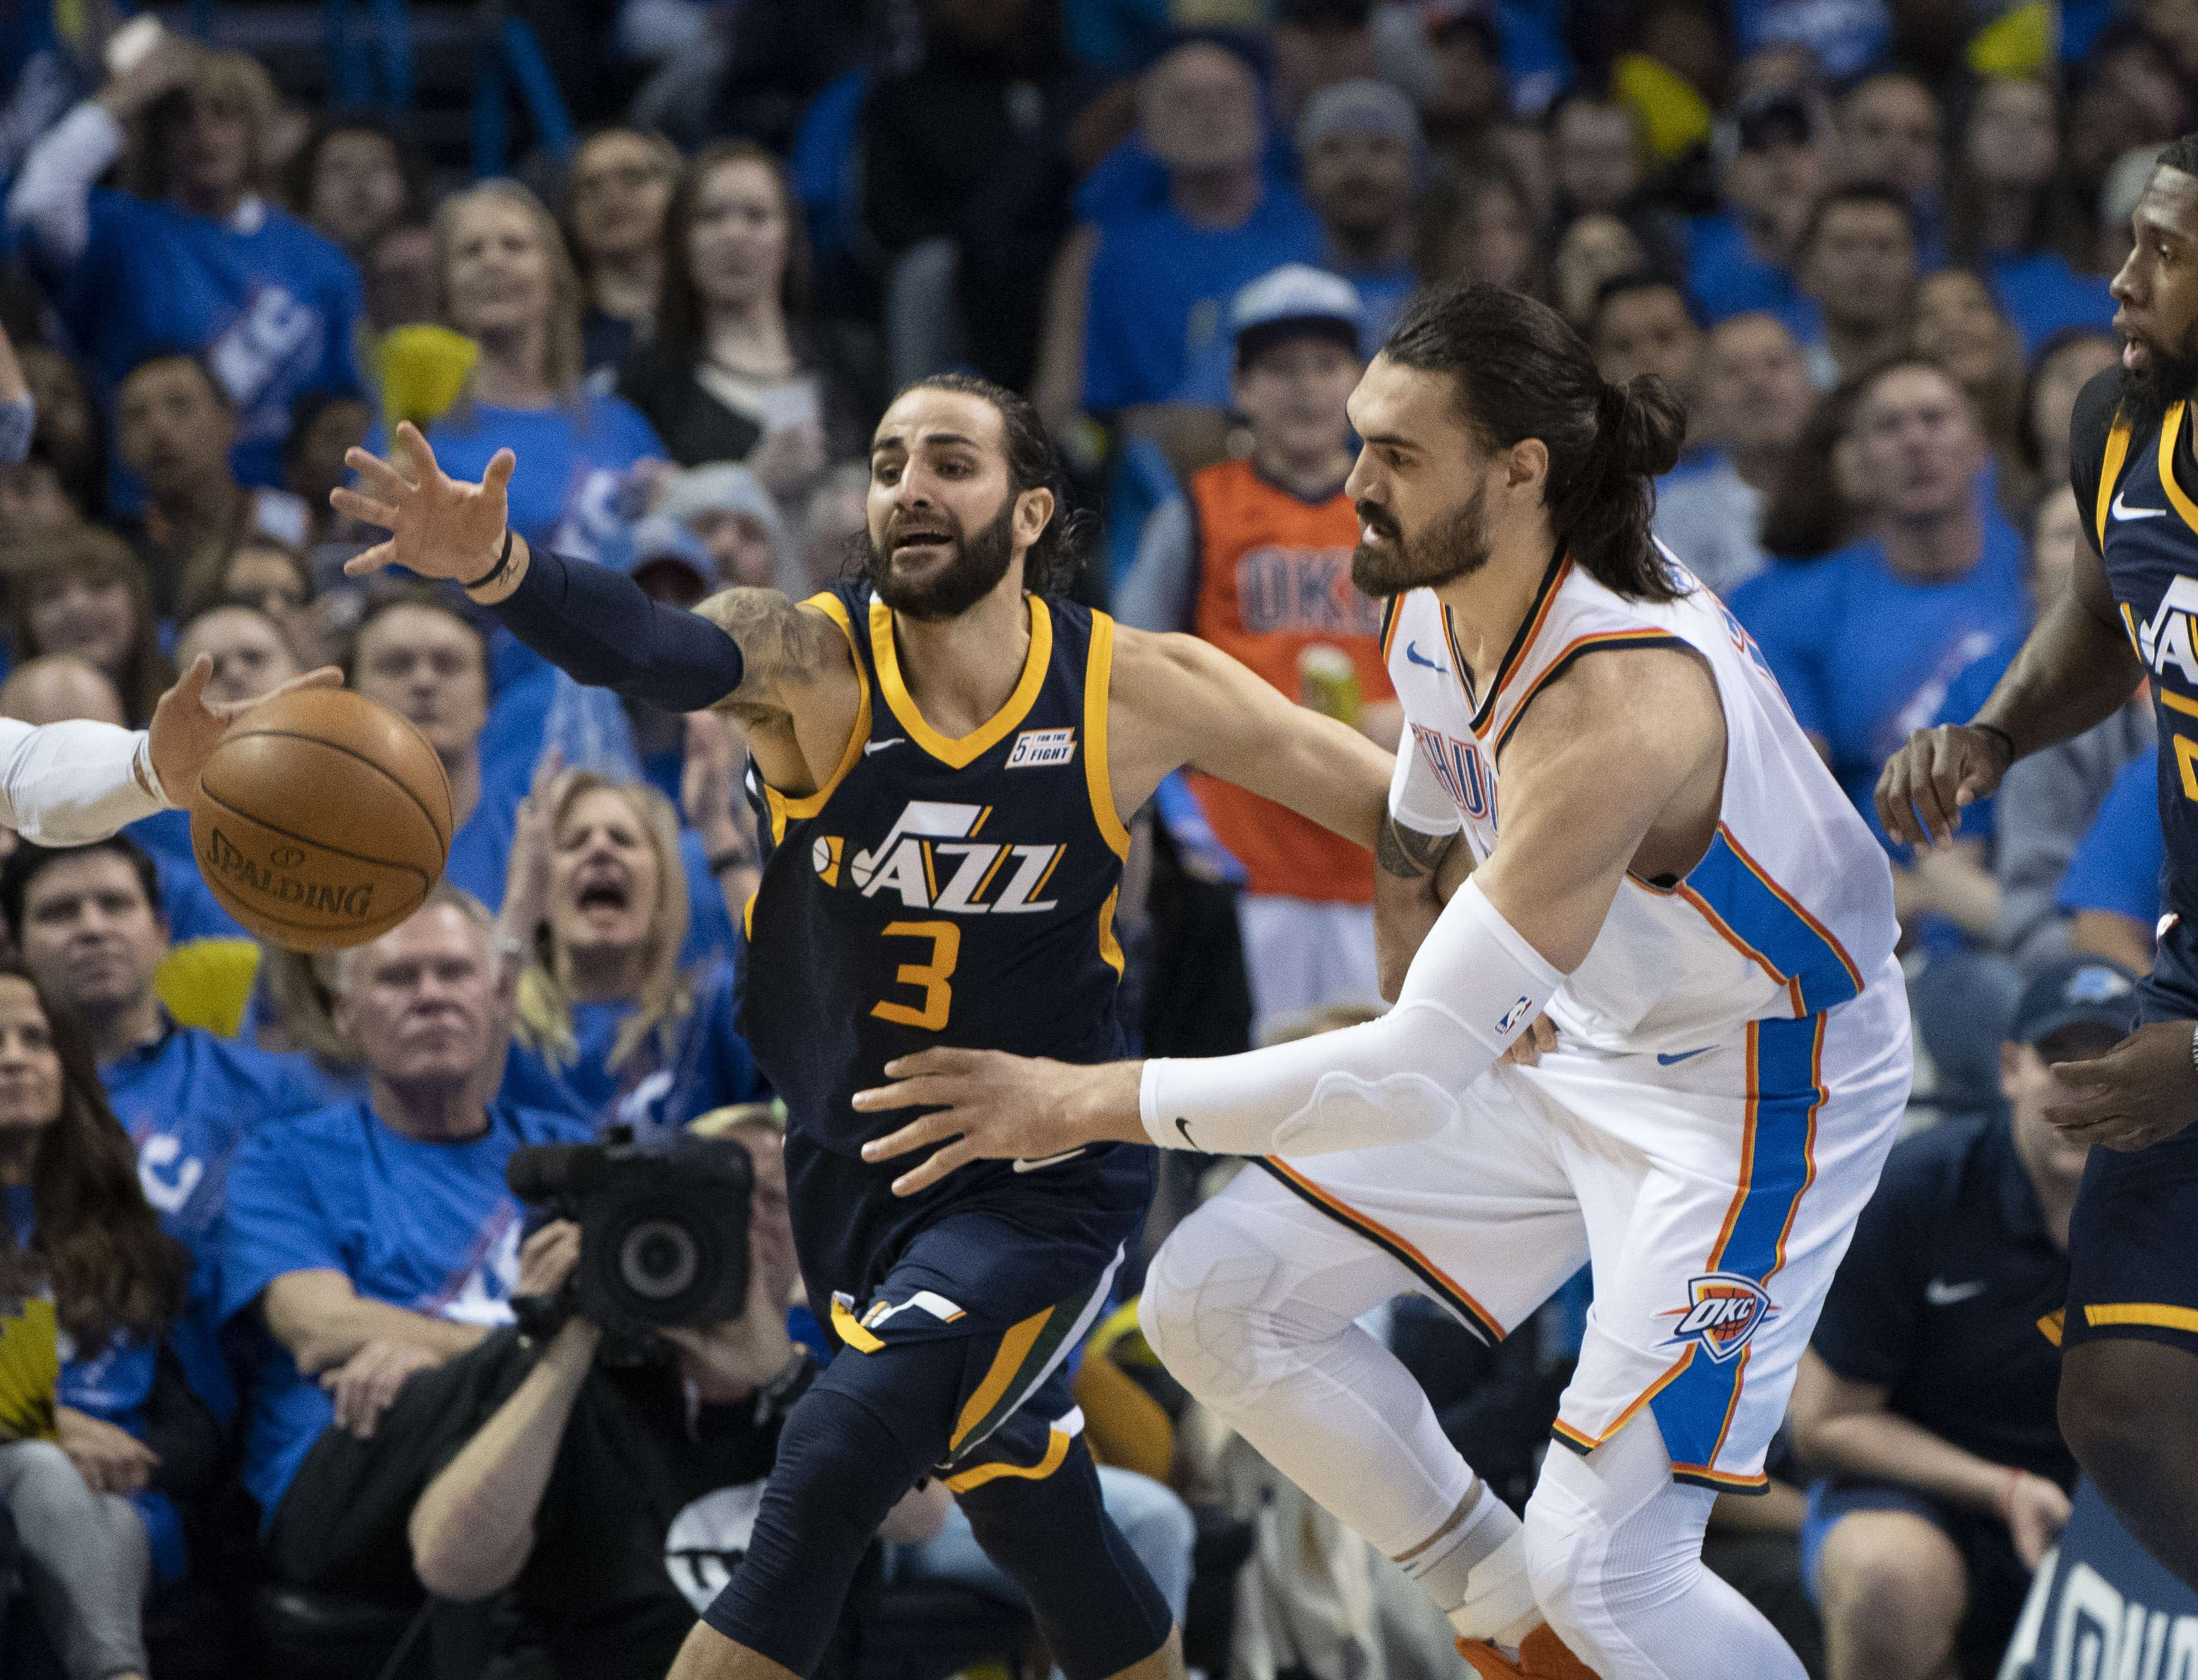 Thunder toma ventaja tras vencer a Jazz y Harden lidera a los Rockets